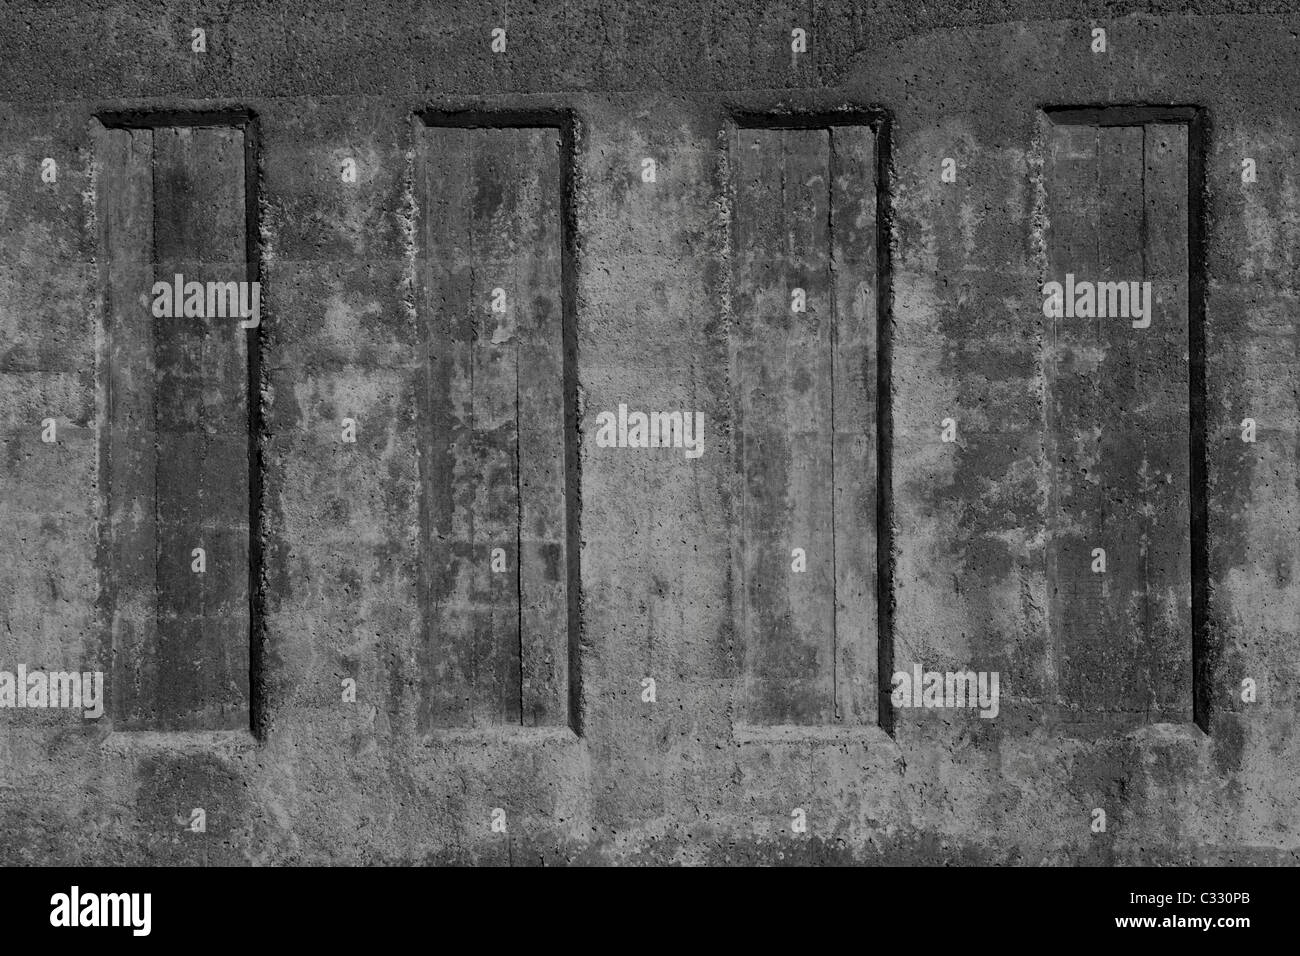 Concrete Wall - Stock Image